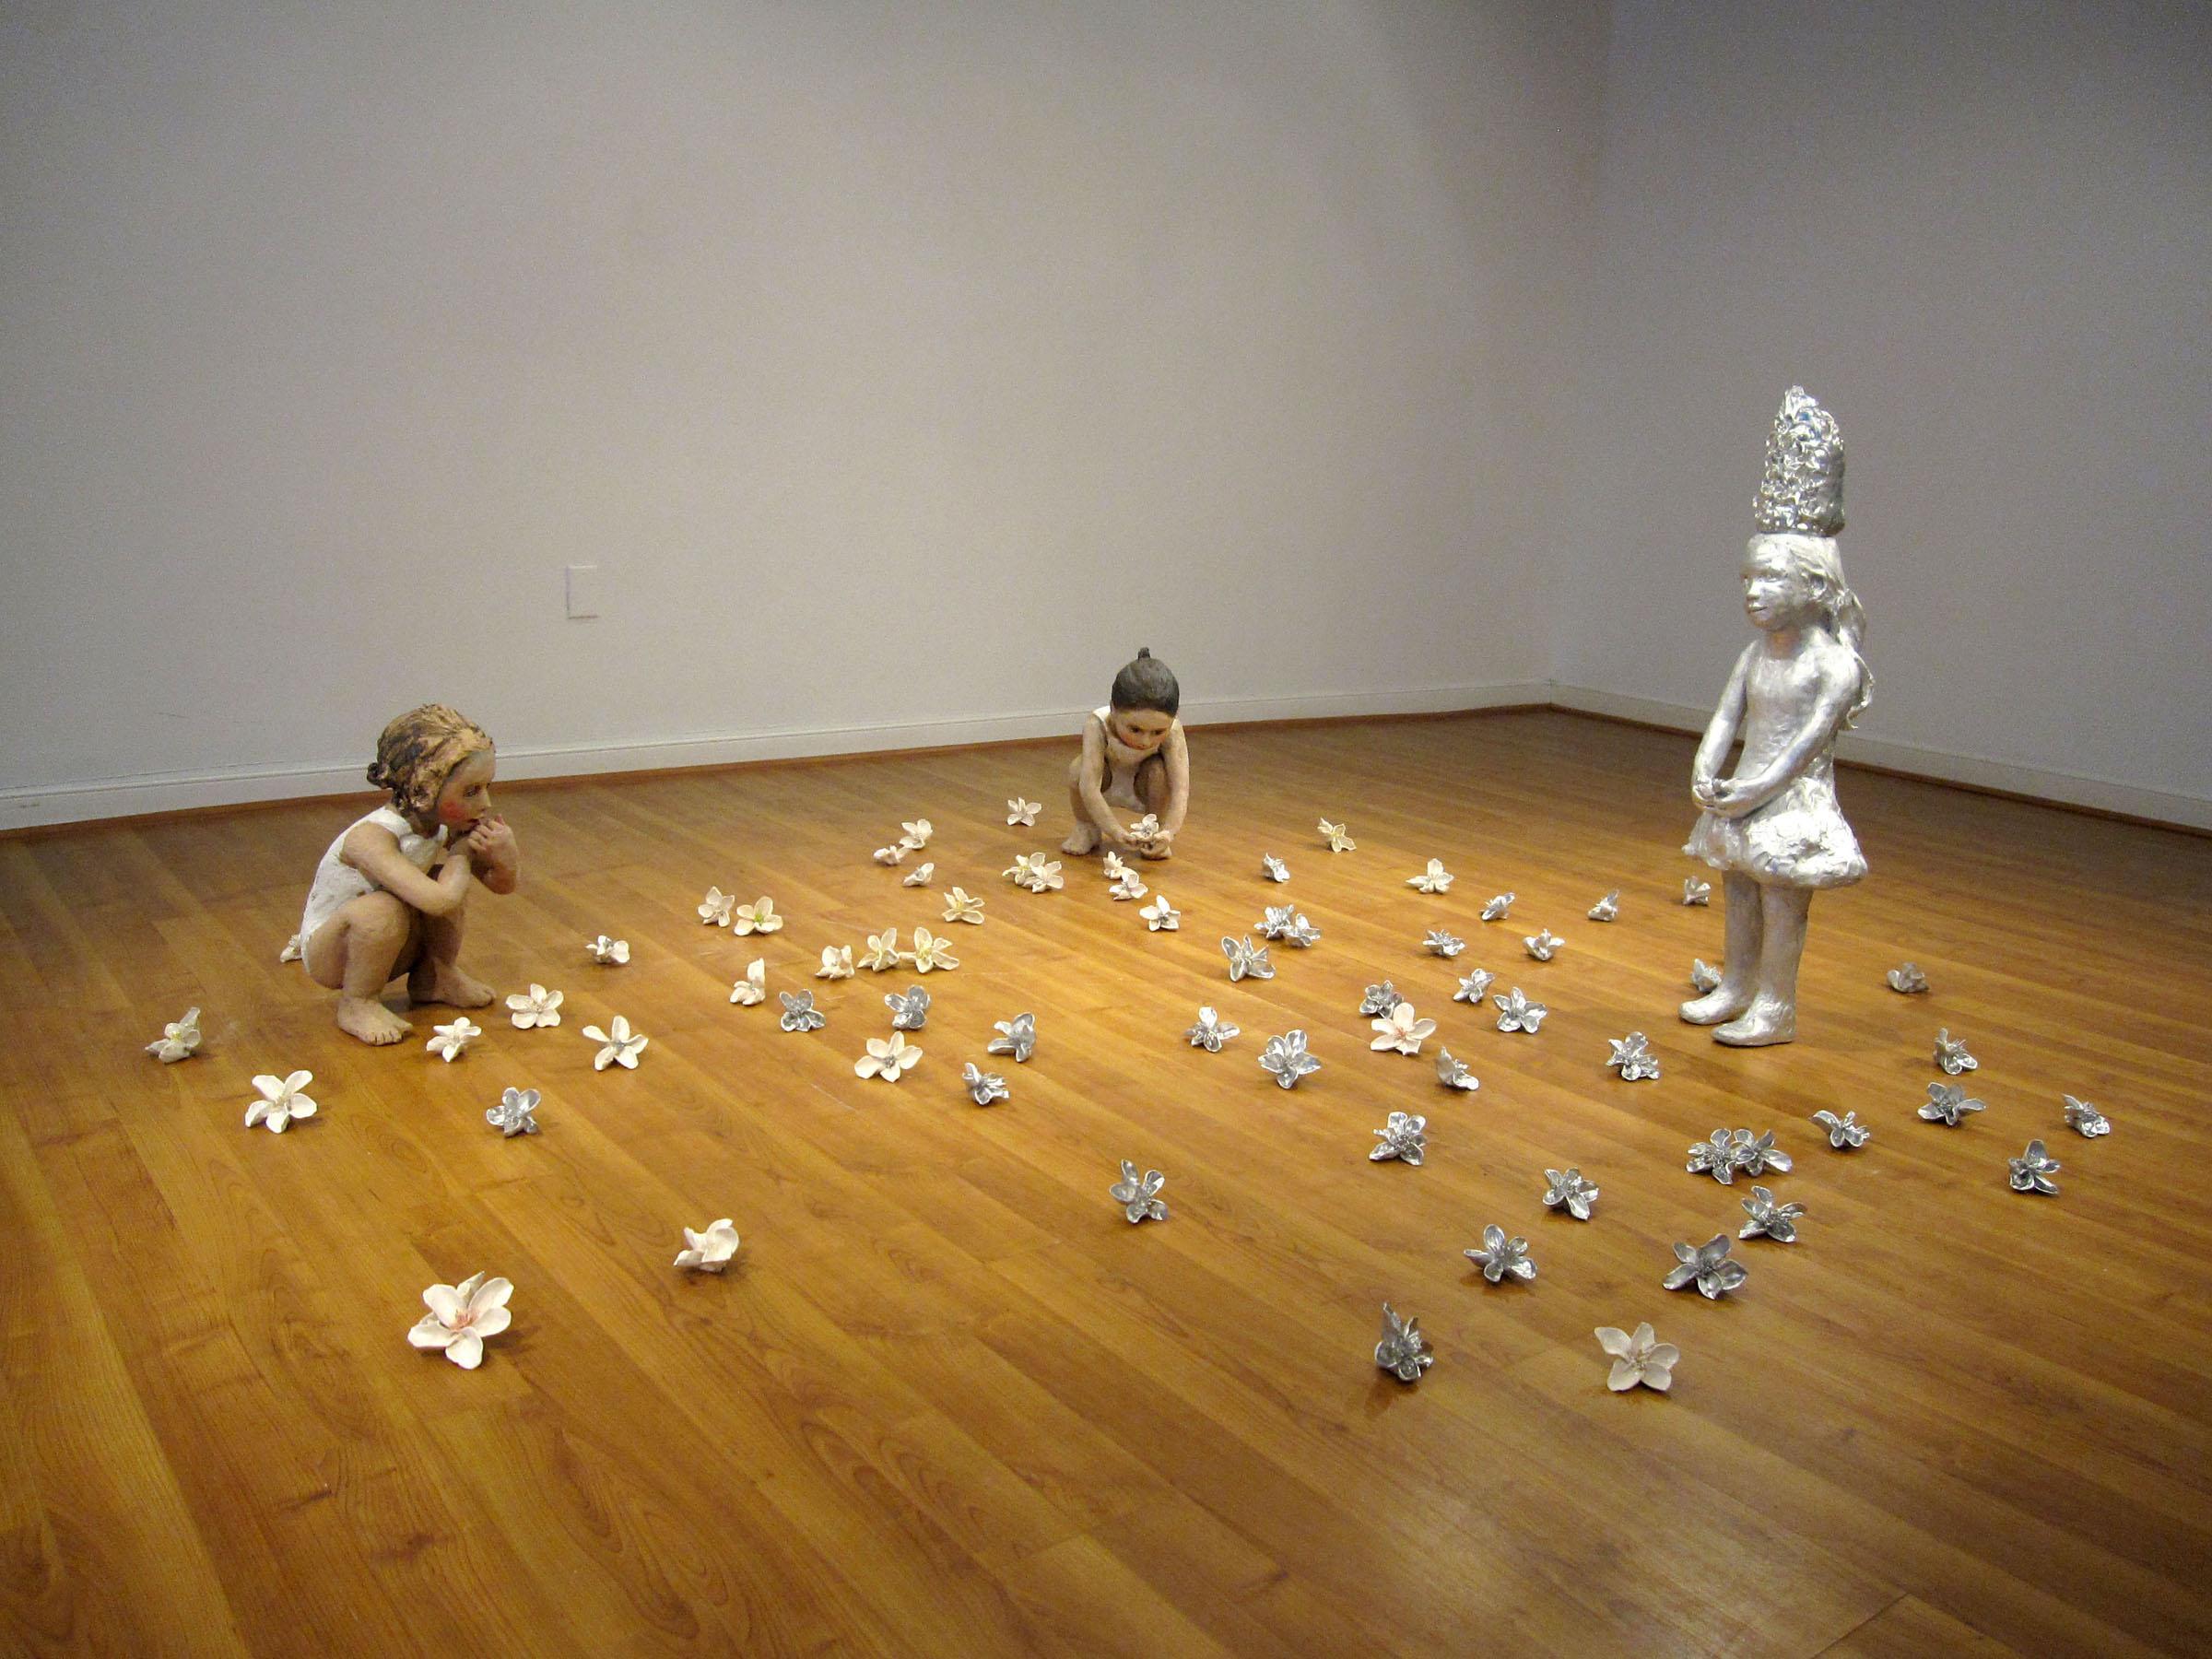 Flower Eaters, 2009, Ceramic, Floor Installation 41 in. X 20 ft. X 18 ft.